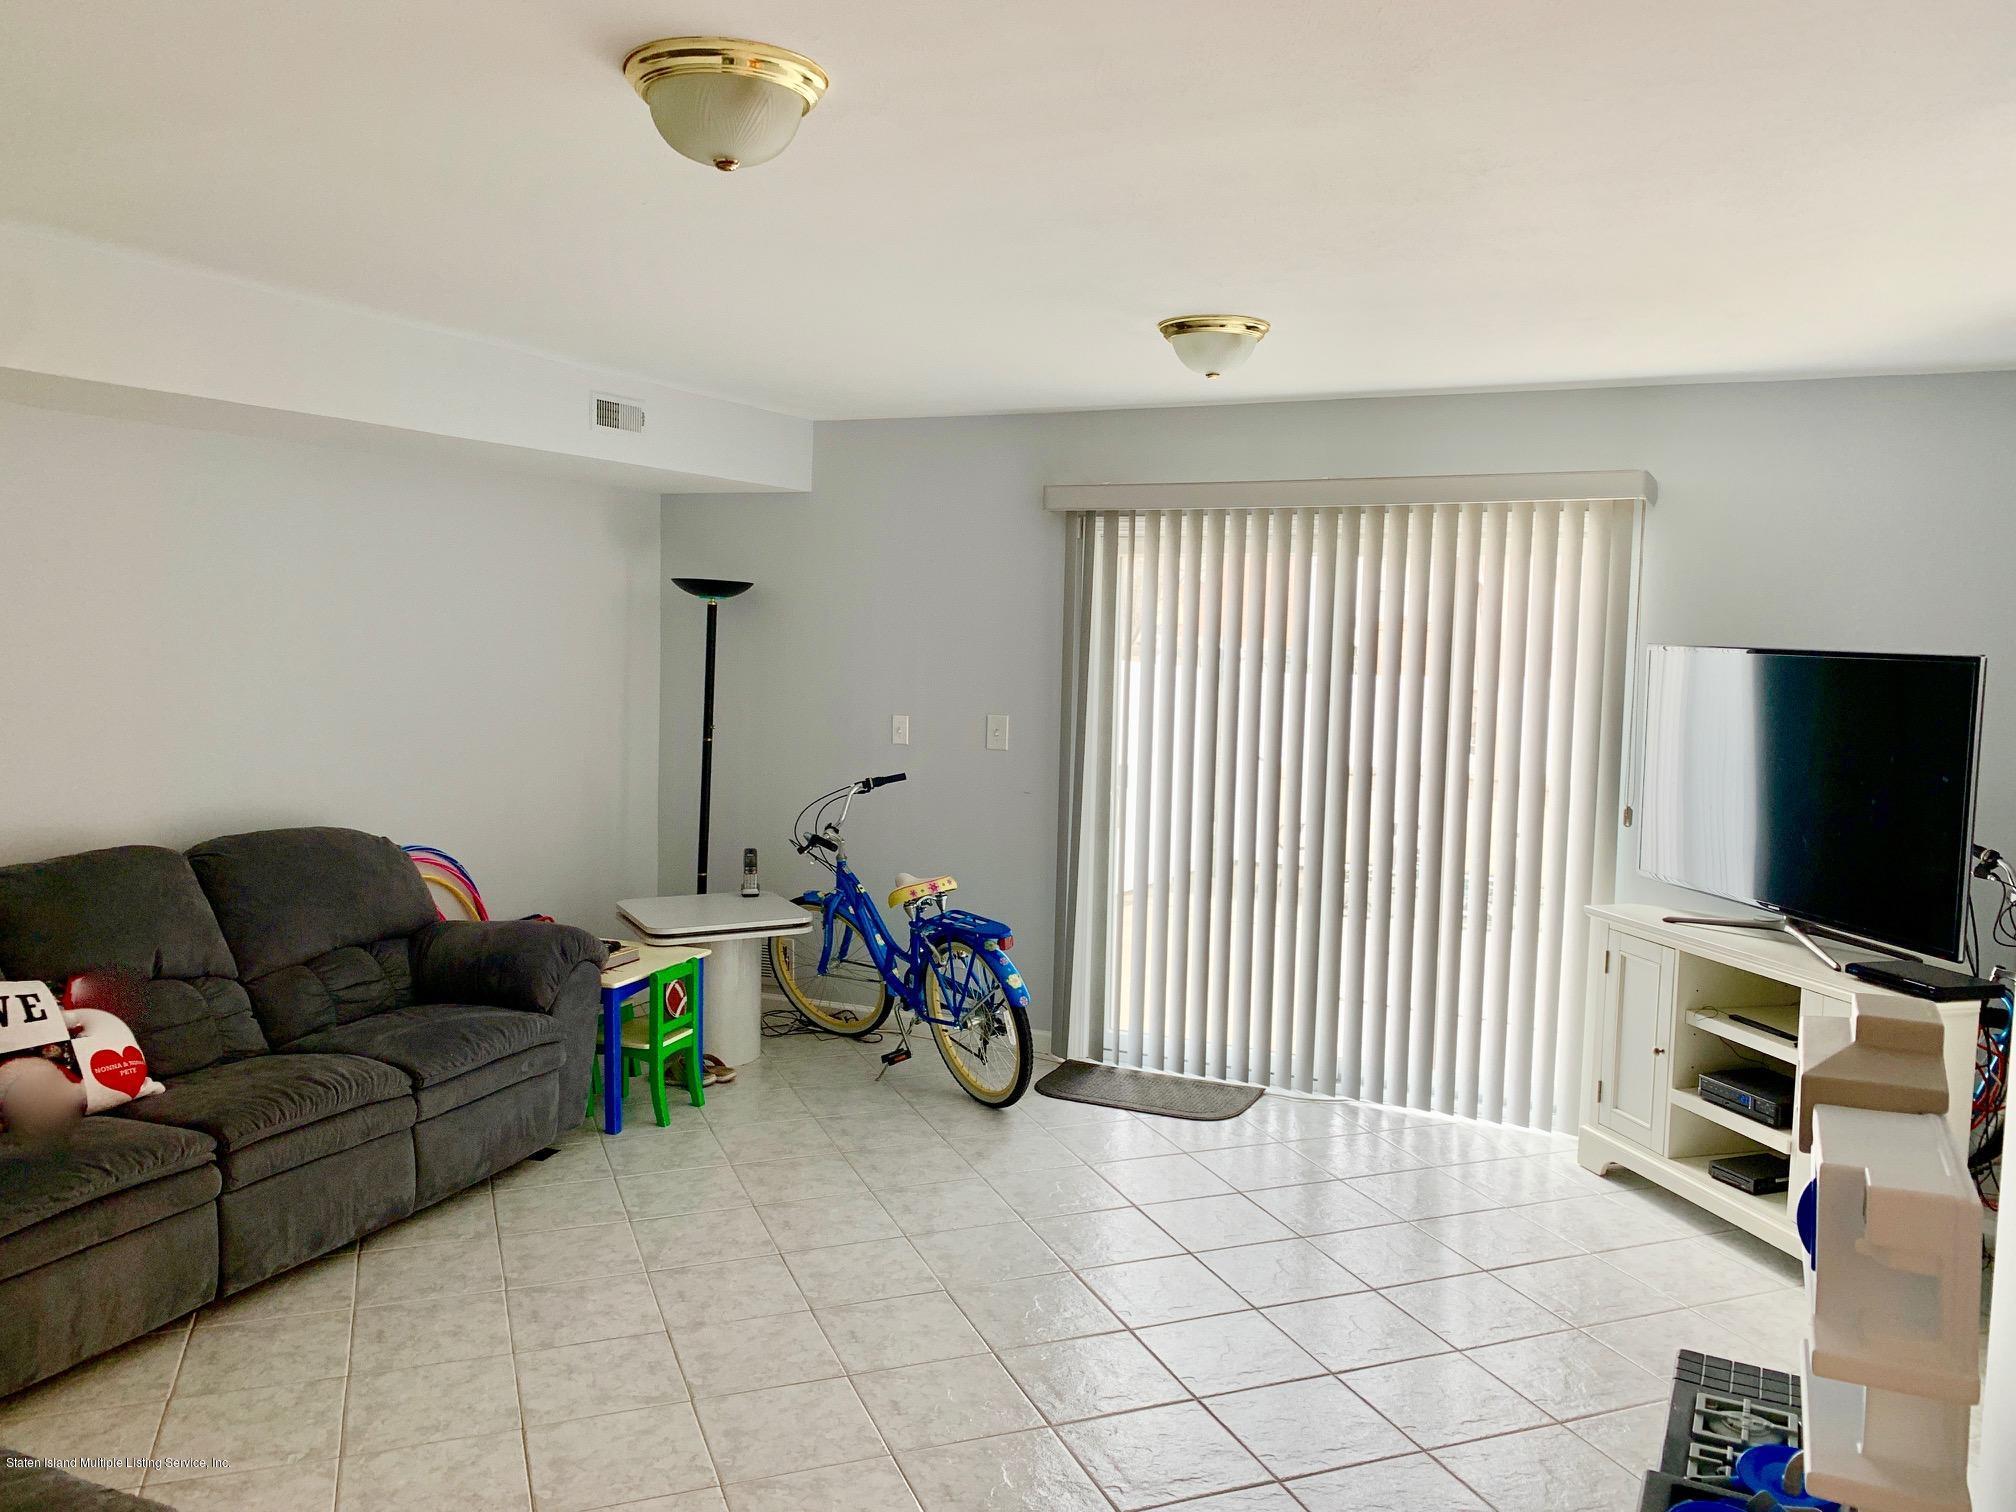 Single Family - Attached 99 Cedar Grove   Staten Island, NY 10306, MLS-1132231-14